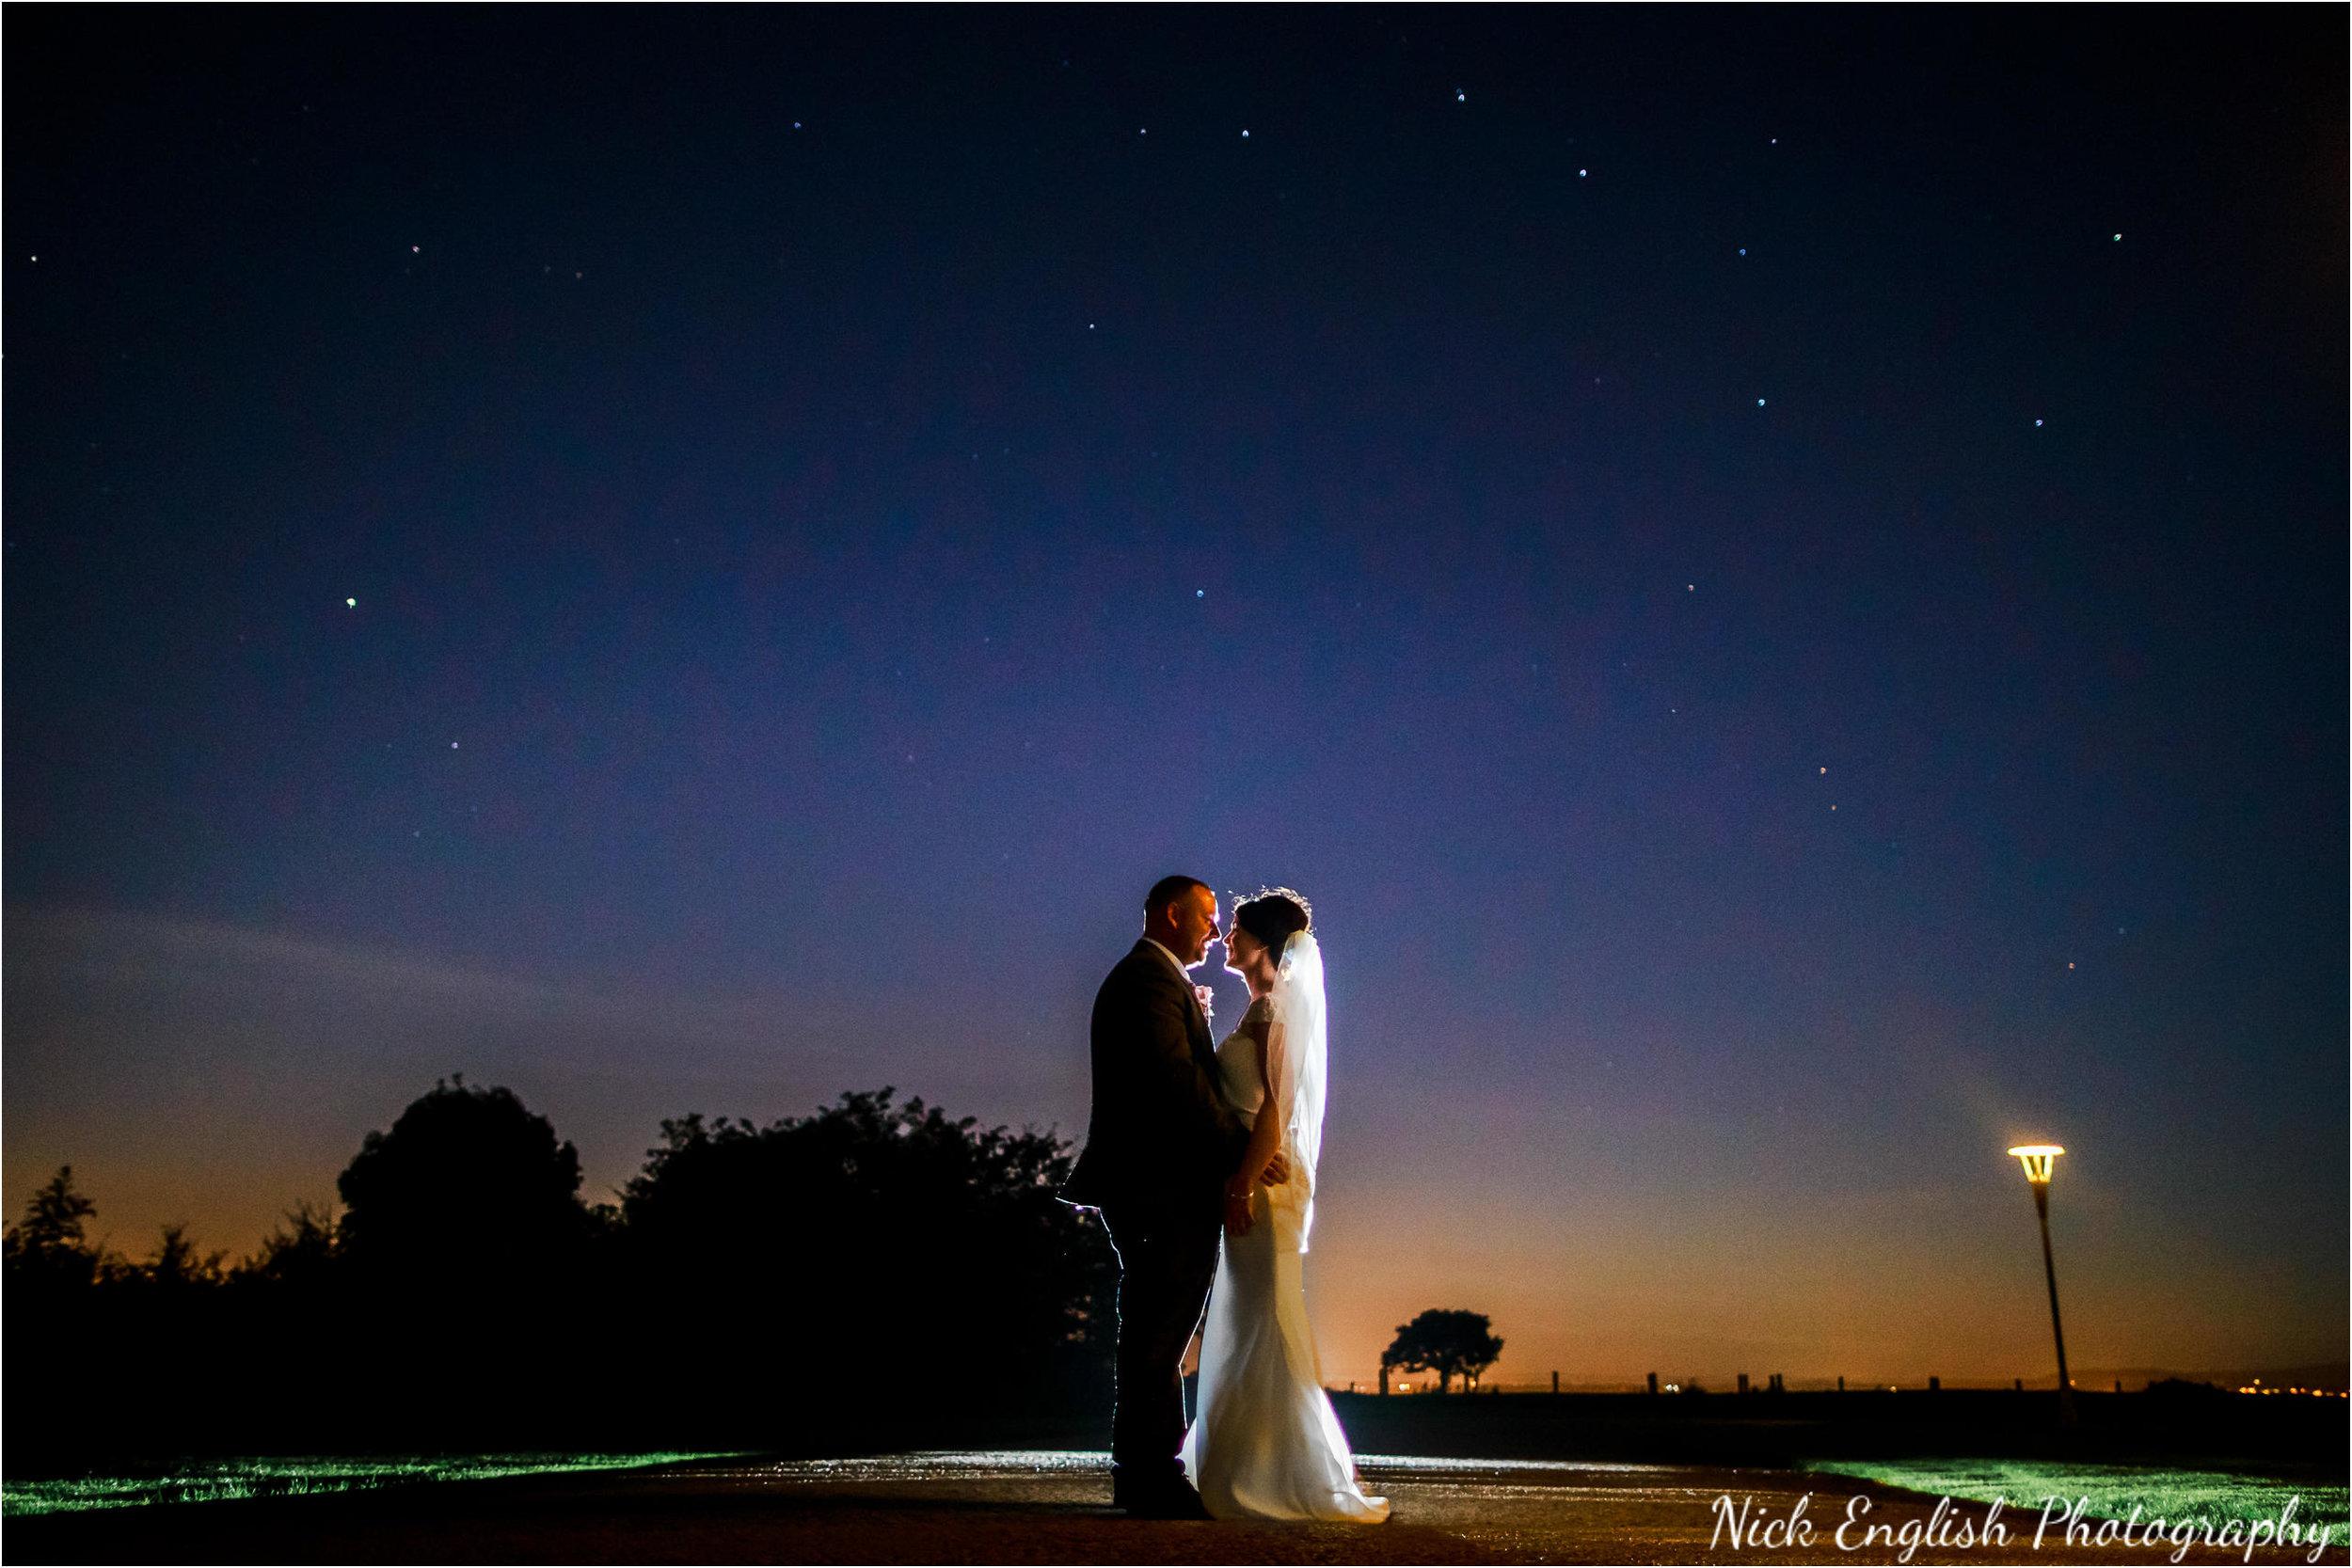 Stacey-Ash-Wedding-Photographs-Stanley-House-Preston-Lancashire-257.jpg